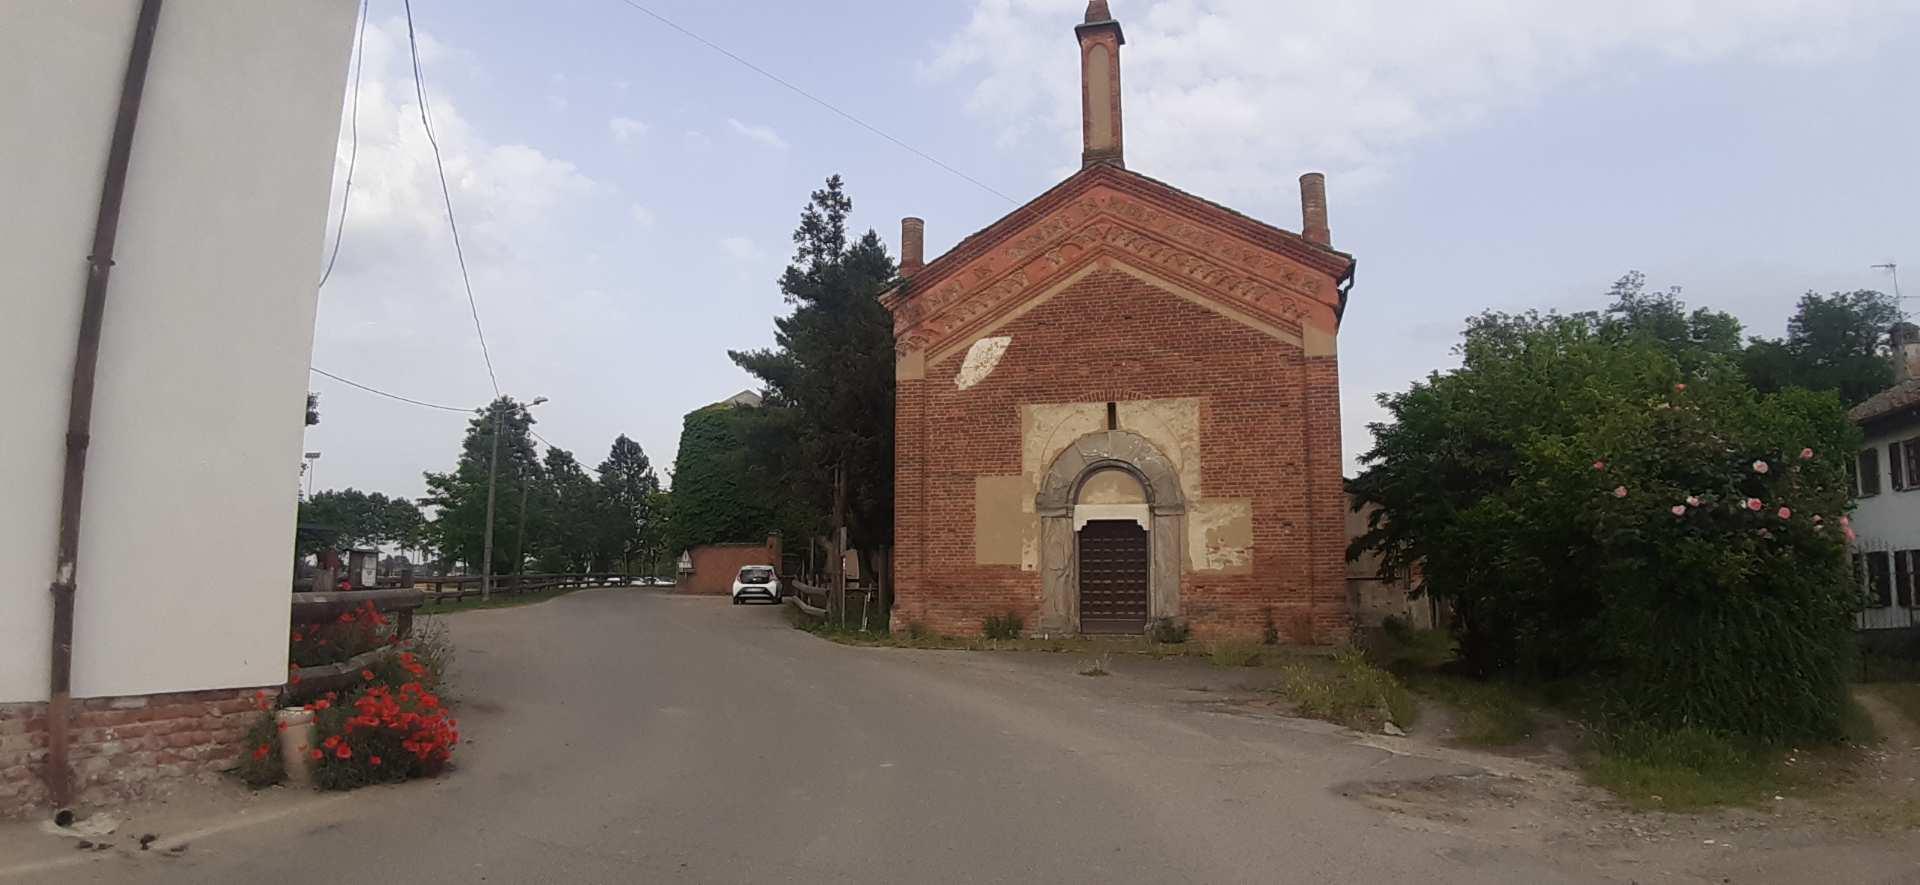 San Zenone Po